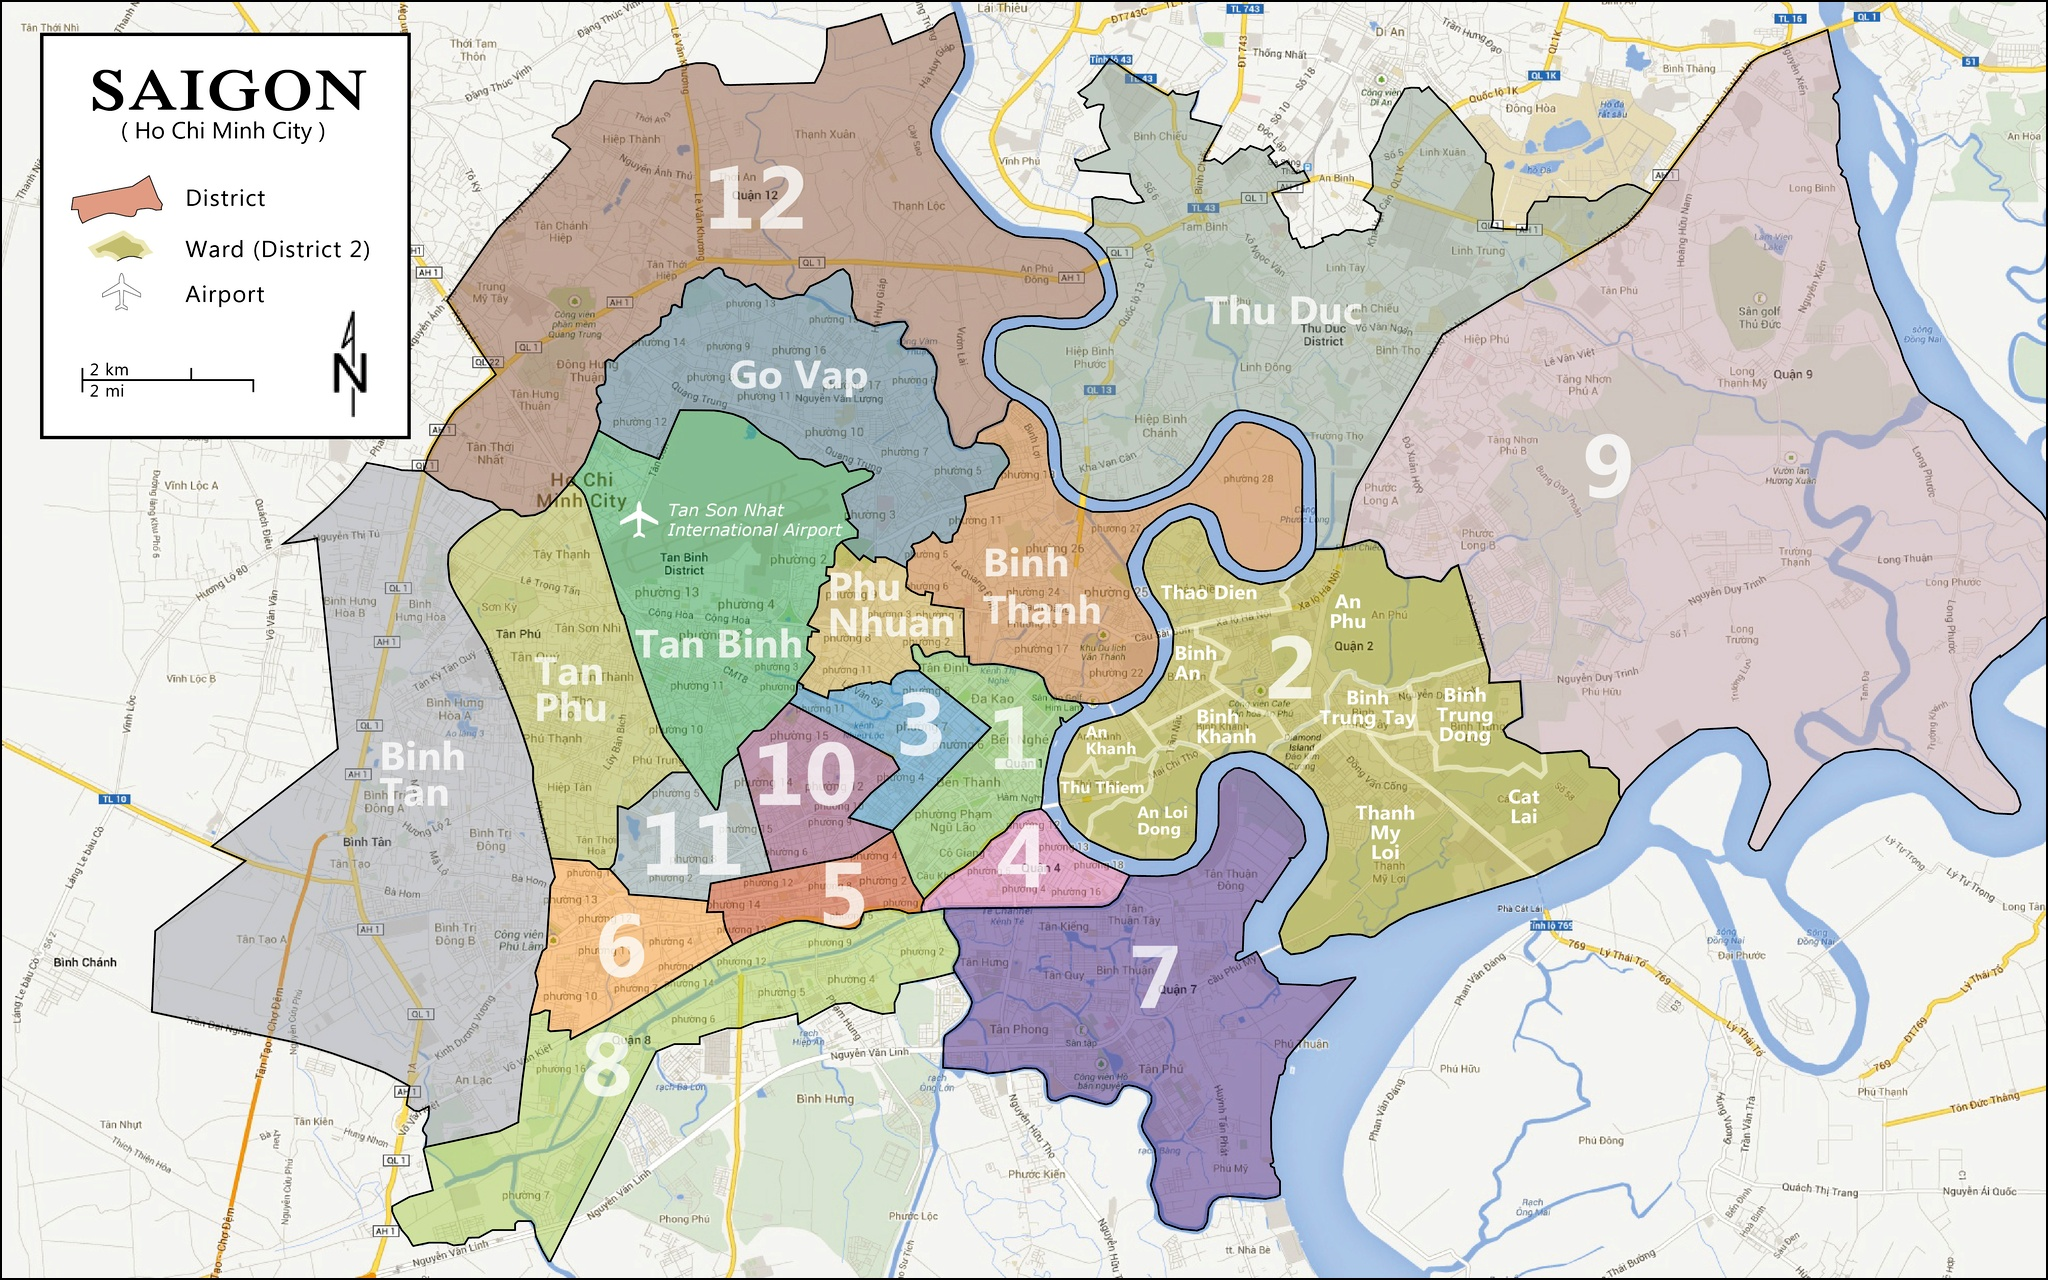 saigon-map.jpg